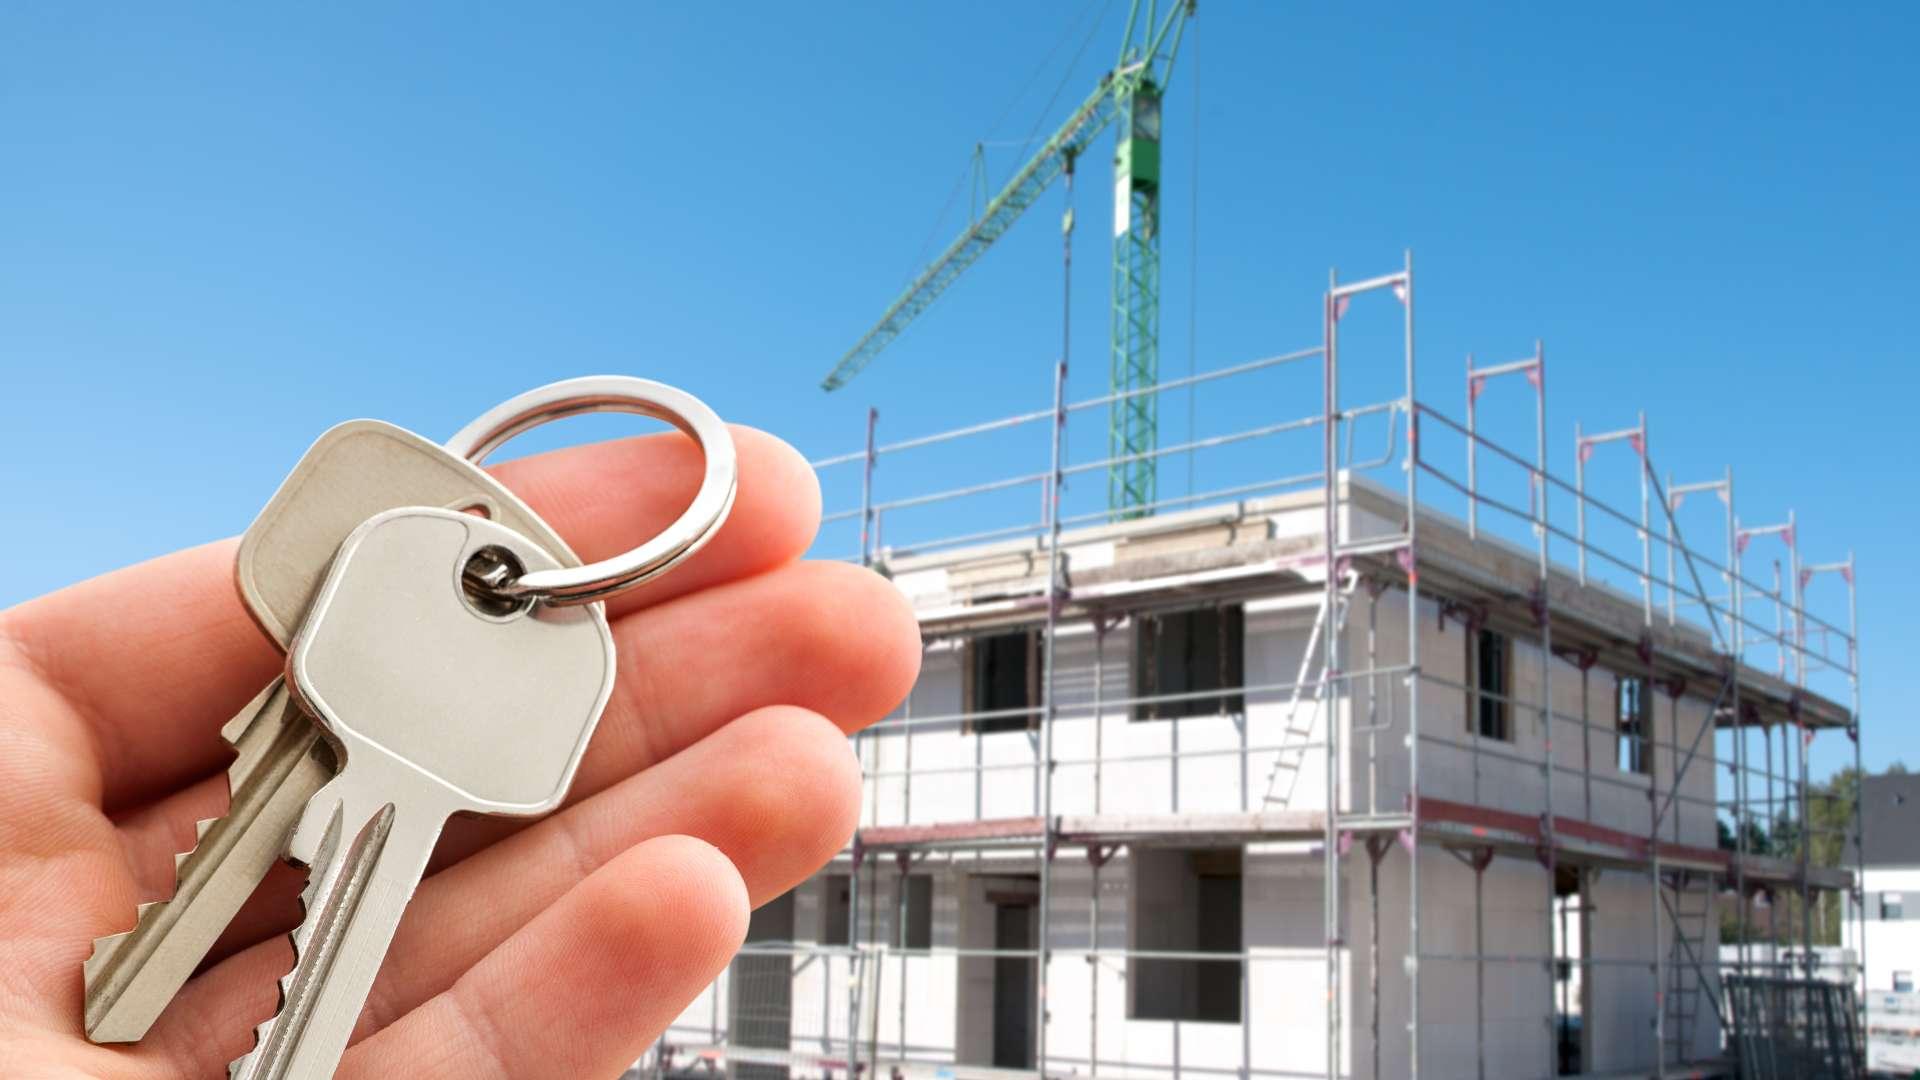 Absurdy rynku nieruchomości - Polak bogatszy niż Anglik? Open Finance Mediarun nieruchomosci 61133591